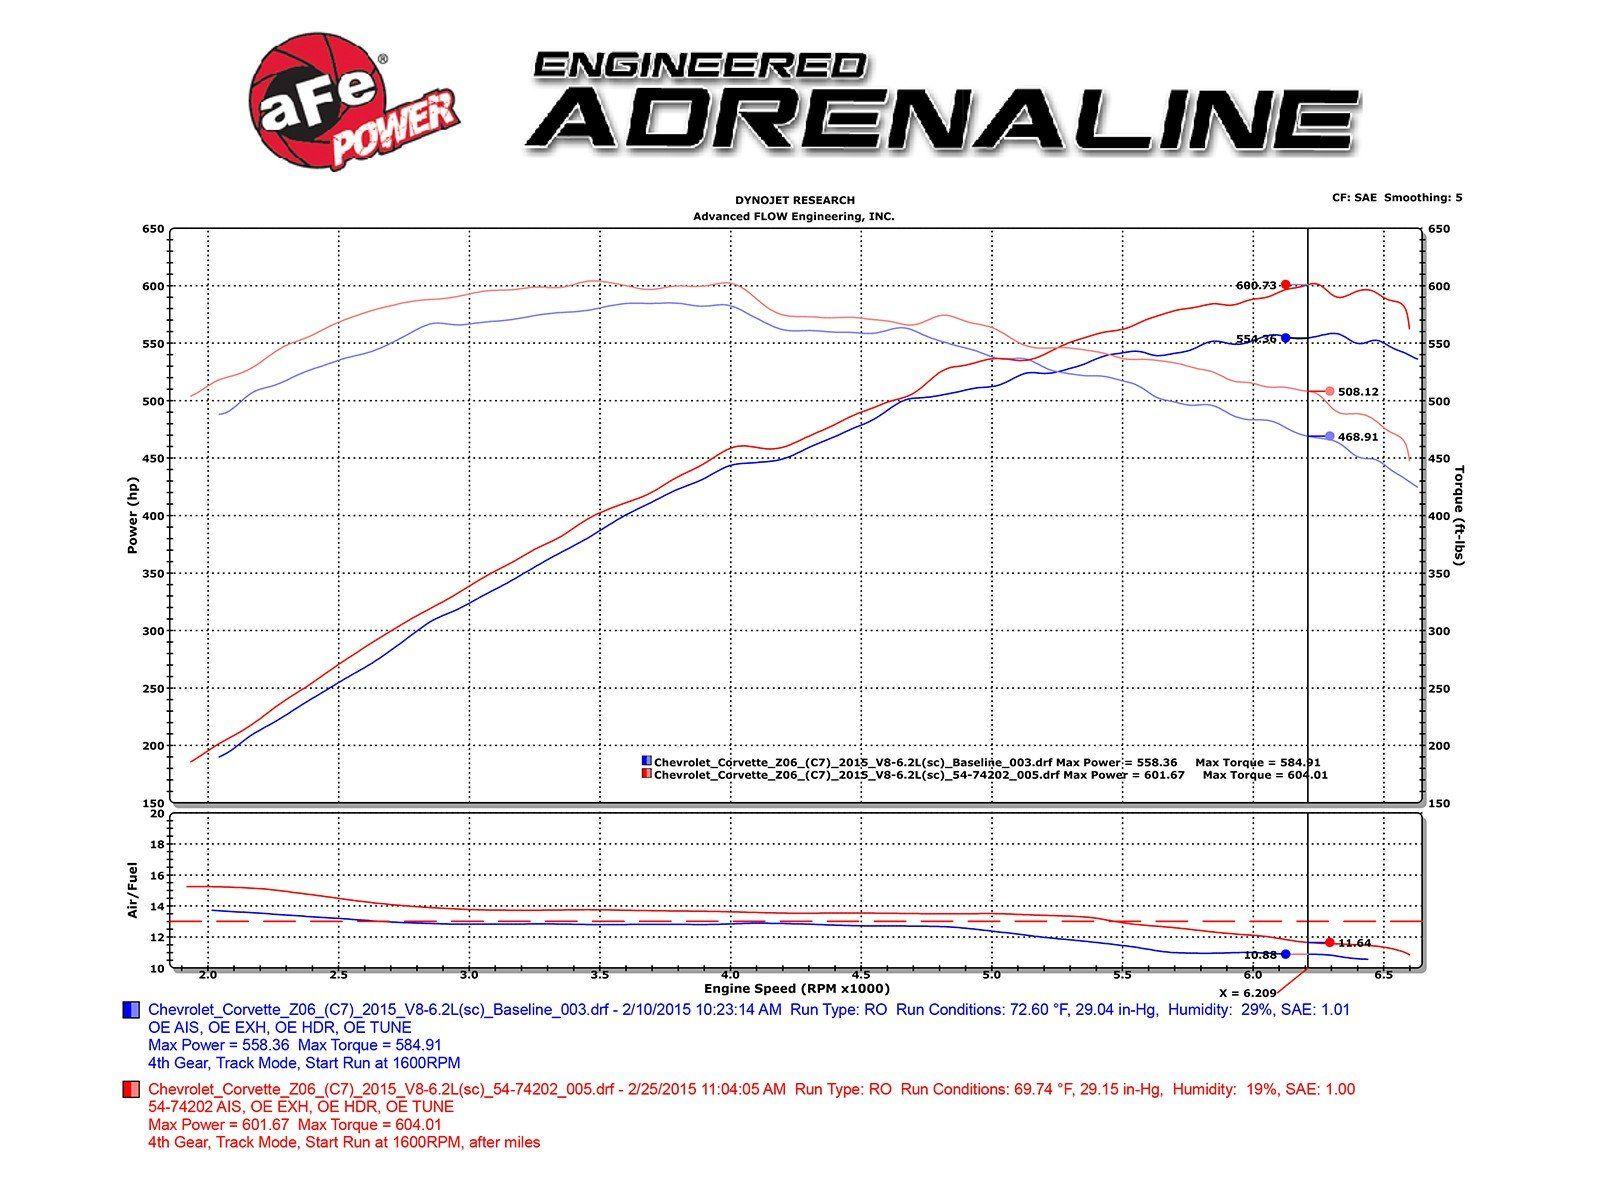 Afe Momentum Gt Cold Air Intake Corvette Z06 C7 V8 6 2l Sc 15 19 52 74202 1 Cold Air Intake Performance Air Filters Corvette